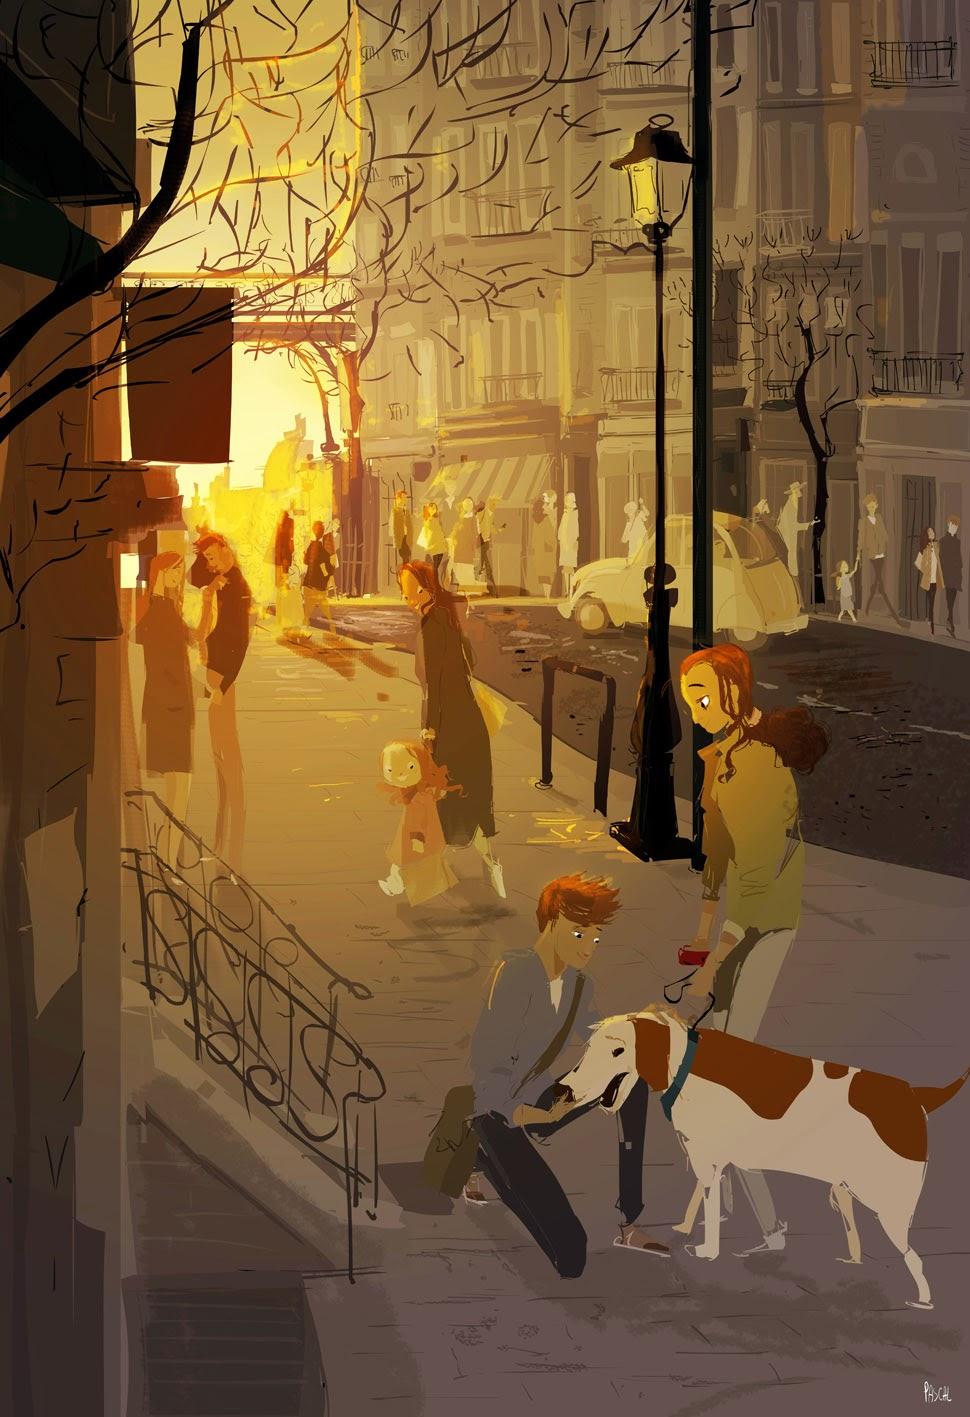 Motivos modernos (Pintura, Fotografía cosas así) - Página 6 2638eb_by_pascalcampion-d6lnq15